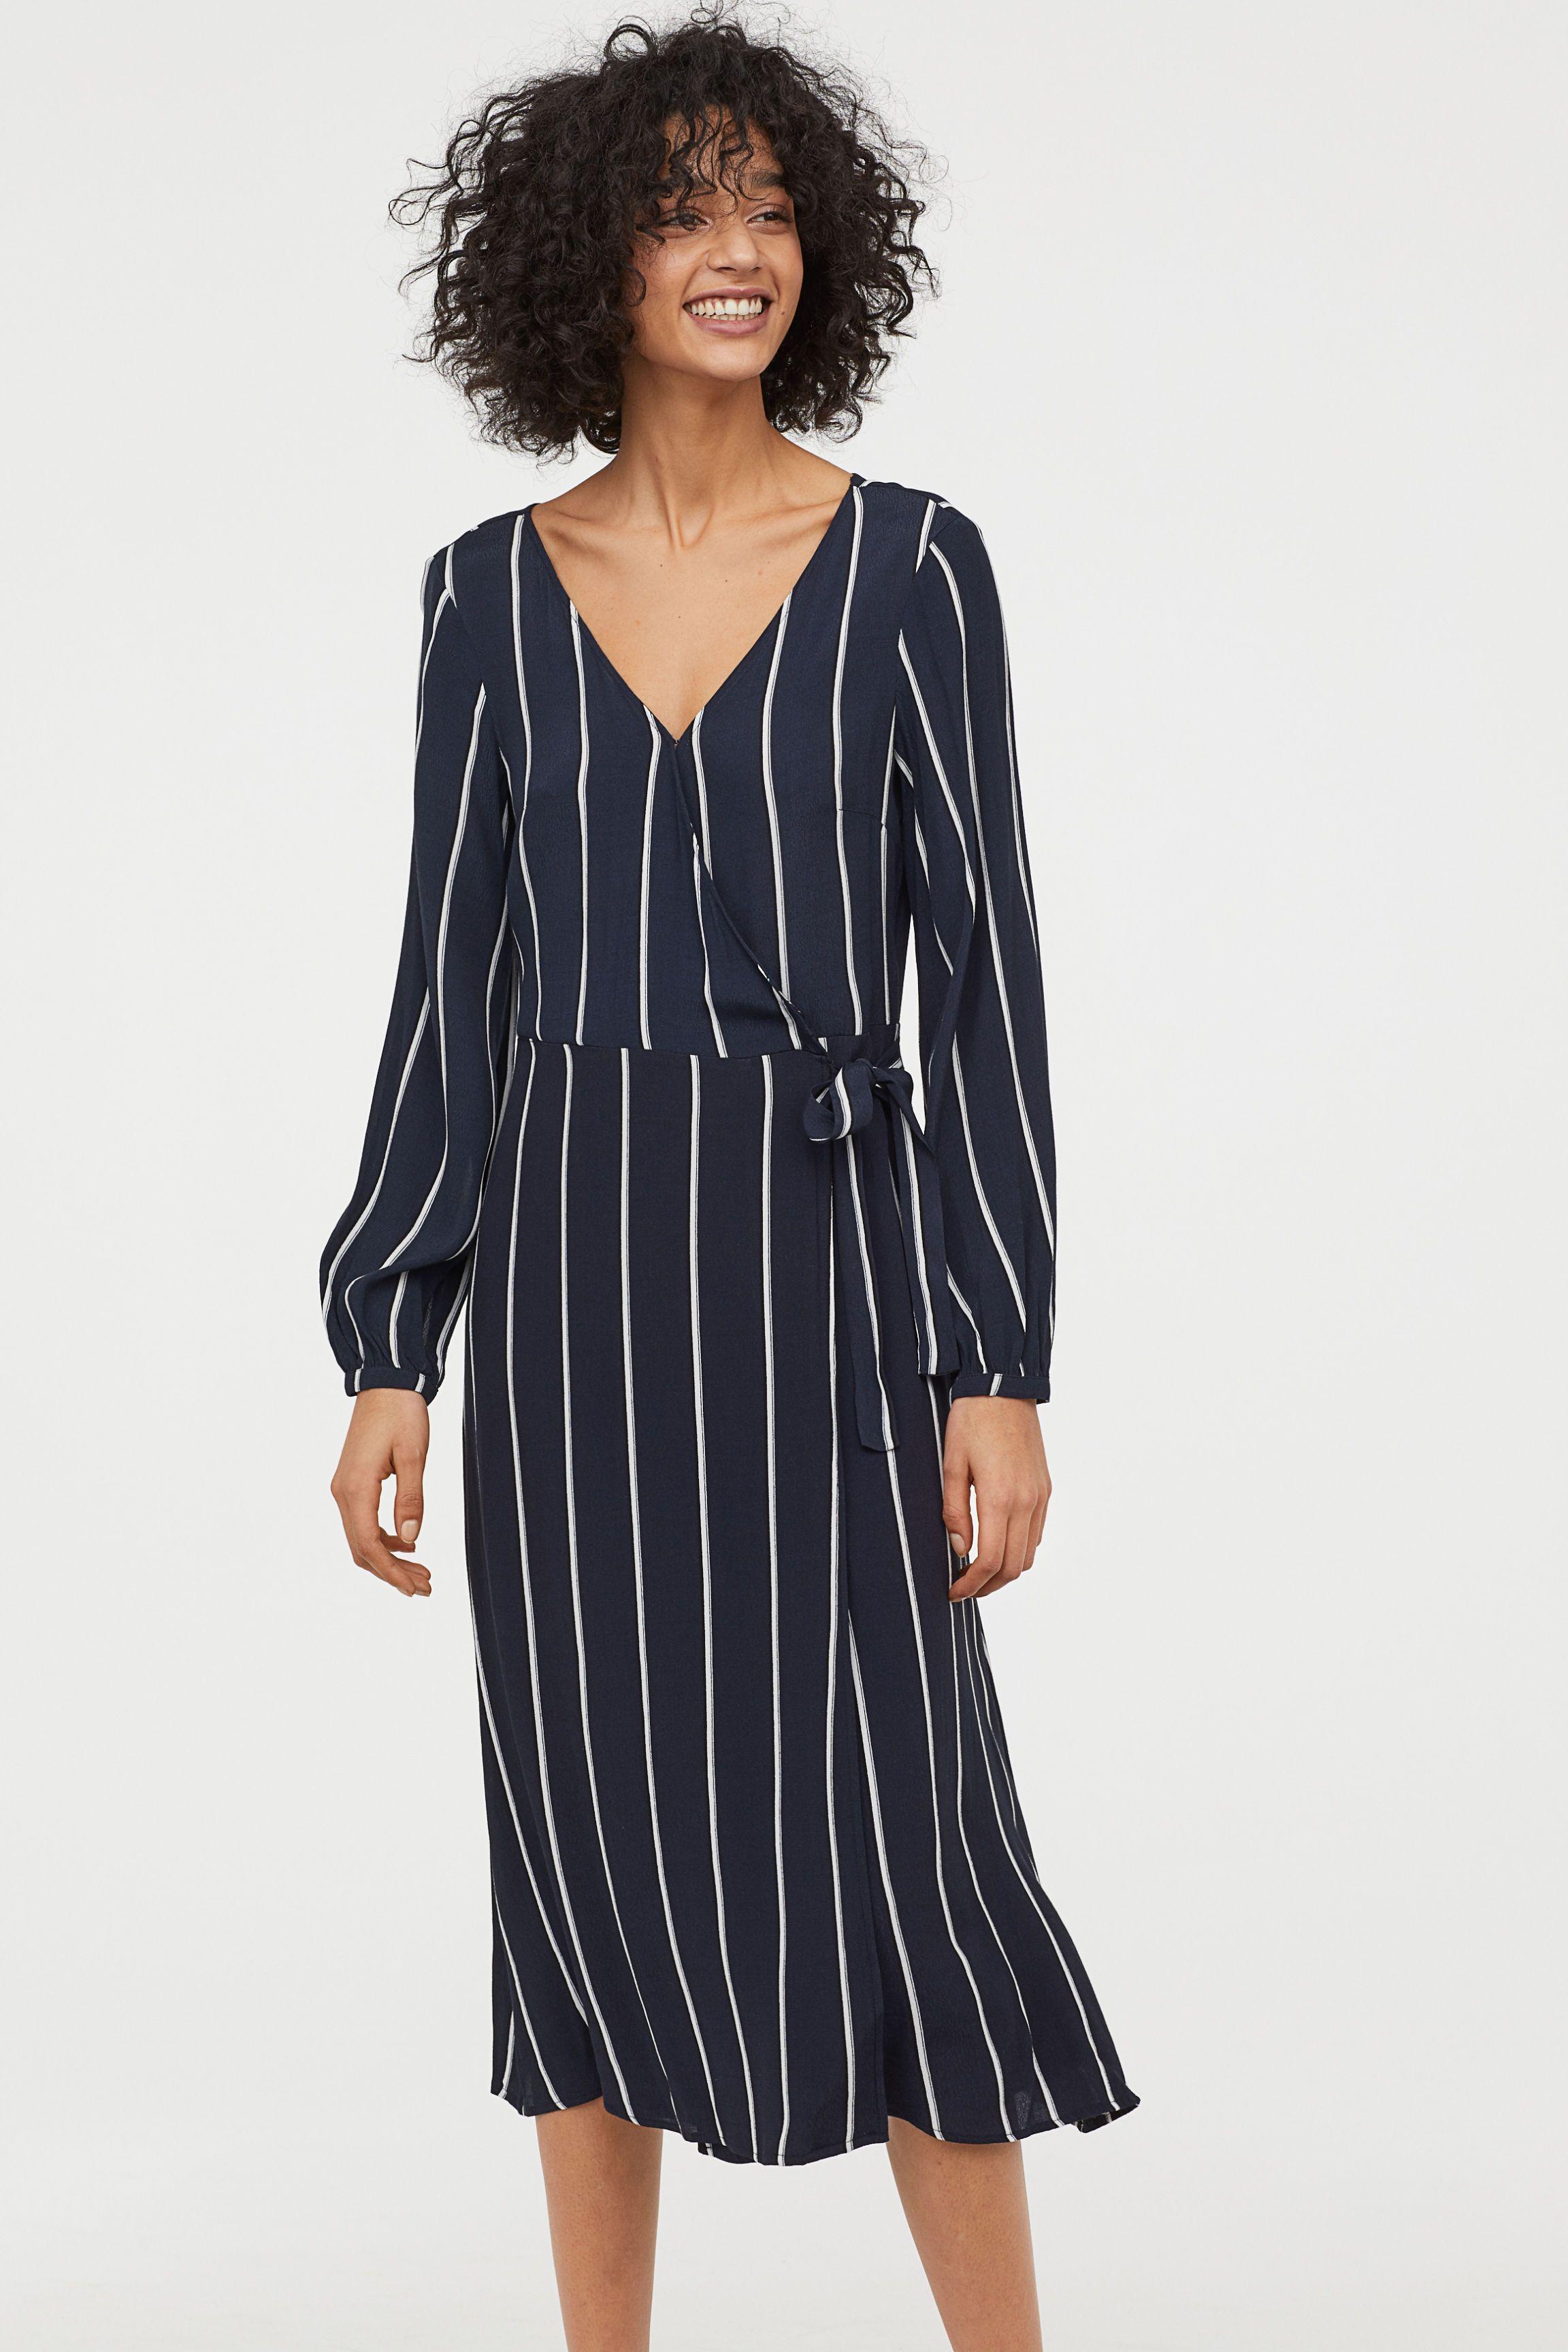 H/&M SUMMER WOMEN LADIES VINTAGE PAISLEY FLORAL MIDI MAXI OPEN BACK DRESS UK 10